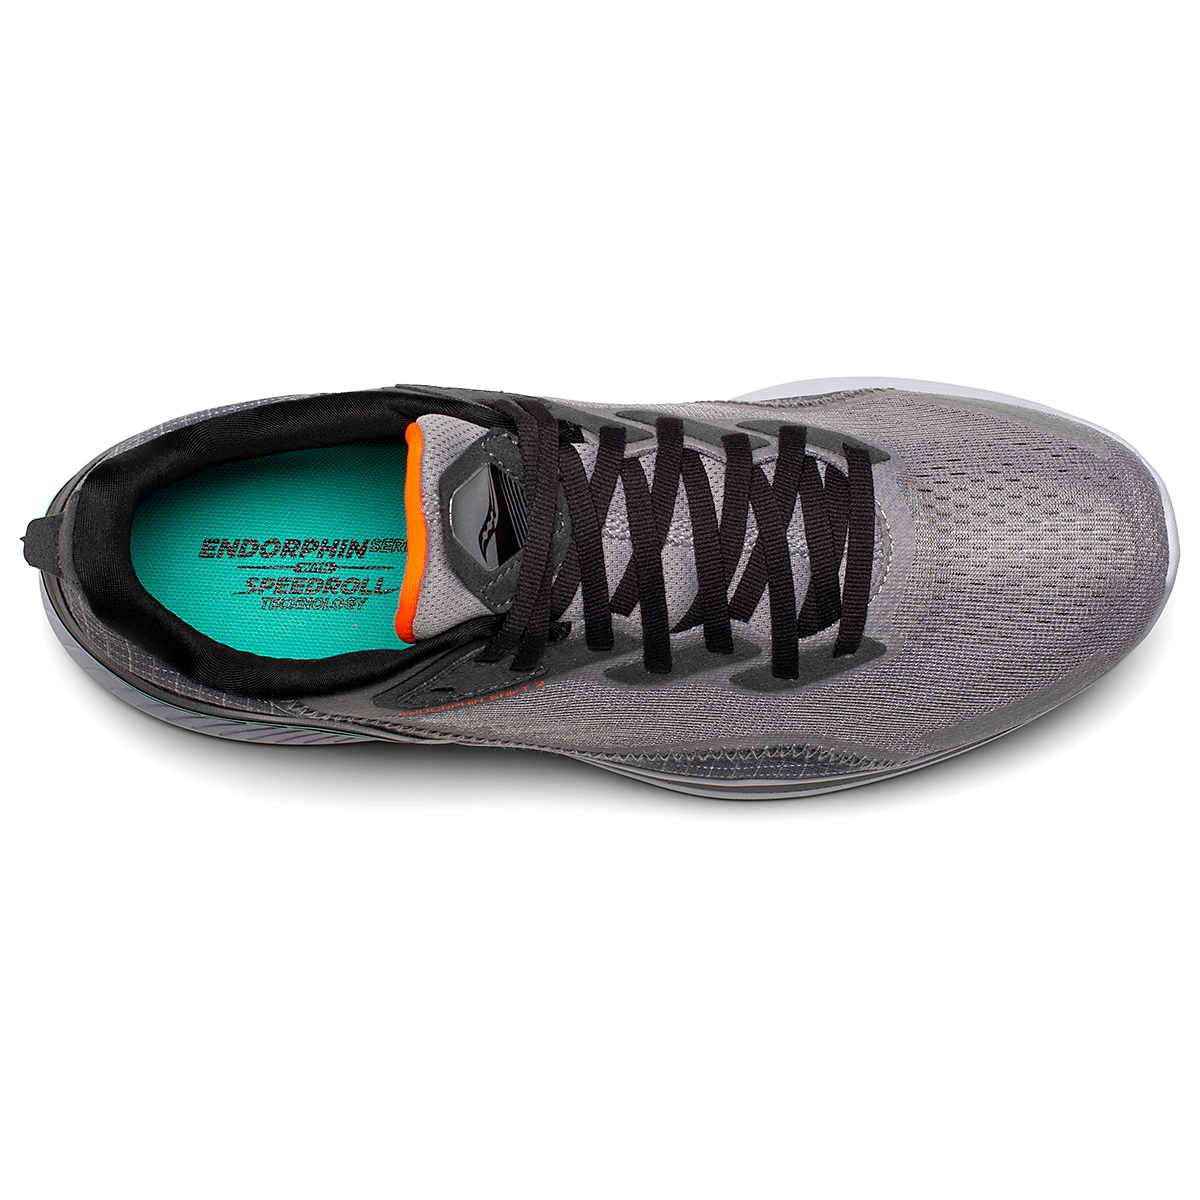 Men's Saucony Endorphin Shift 2 Running Shoe - Color: Alloy / Jade - Size: 7 - Width: Regular, Alloy / Jade, large, image 3